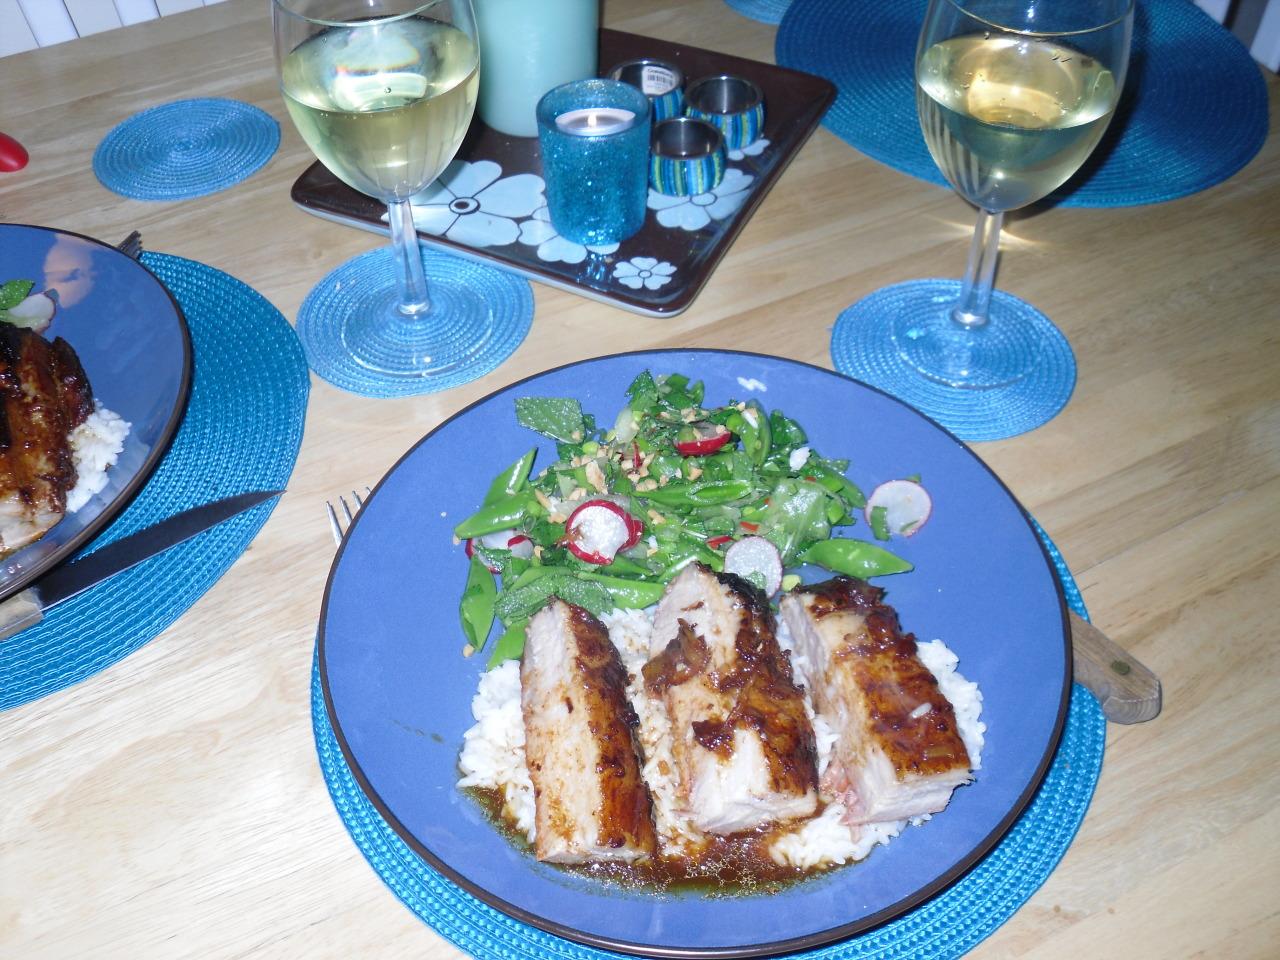 Sticky pork belly with Vietnamese-style salad & smashed peanuts Cooking time Prep: 20 mins Cook: 2 hrs, 25 mins plus 4 hrs marinating Servings Serves 2 Ingredients • 600g pork belly • 6 tbsp hoisin sauce • 3 tbsp clear honey • 3 tbsp rice vinegar • 3...